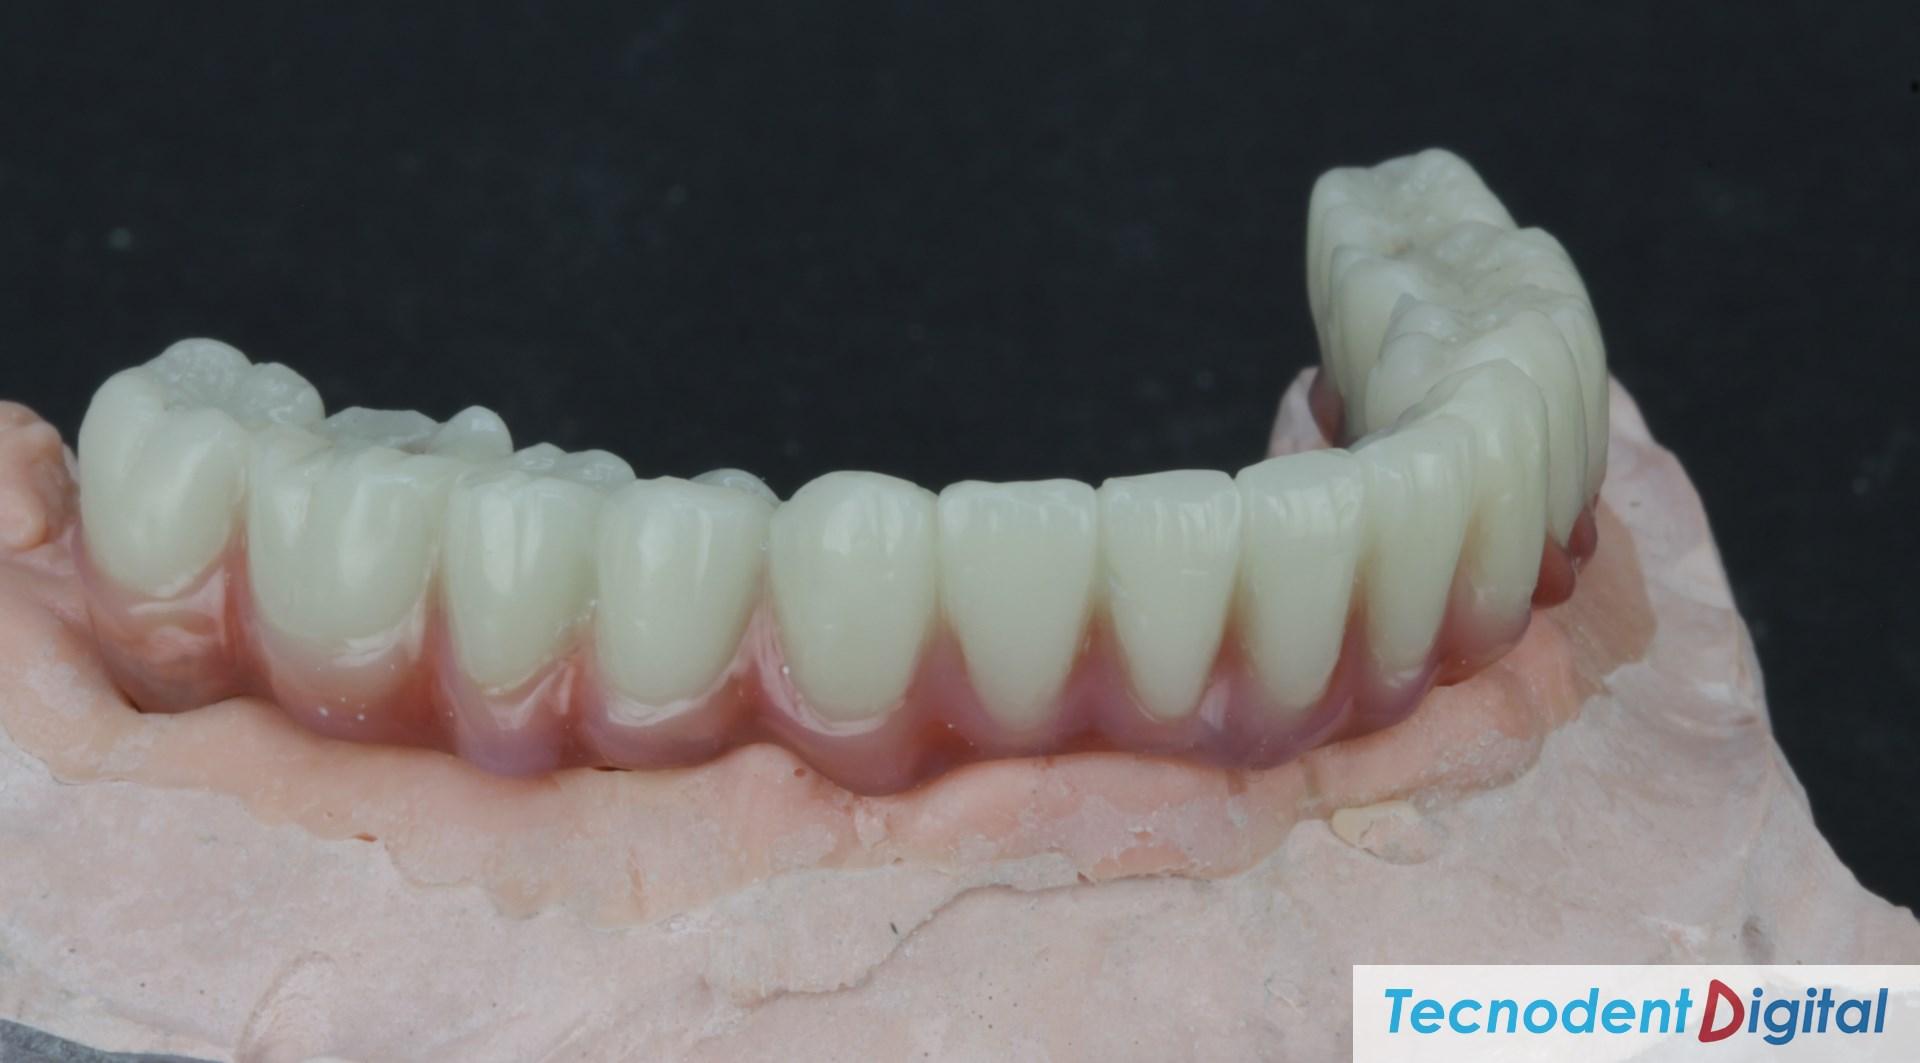 Rehabilitacion implantes Exocad thimble coronas HIPC